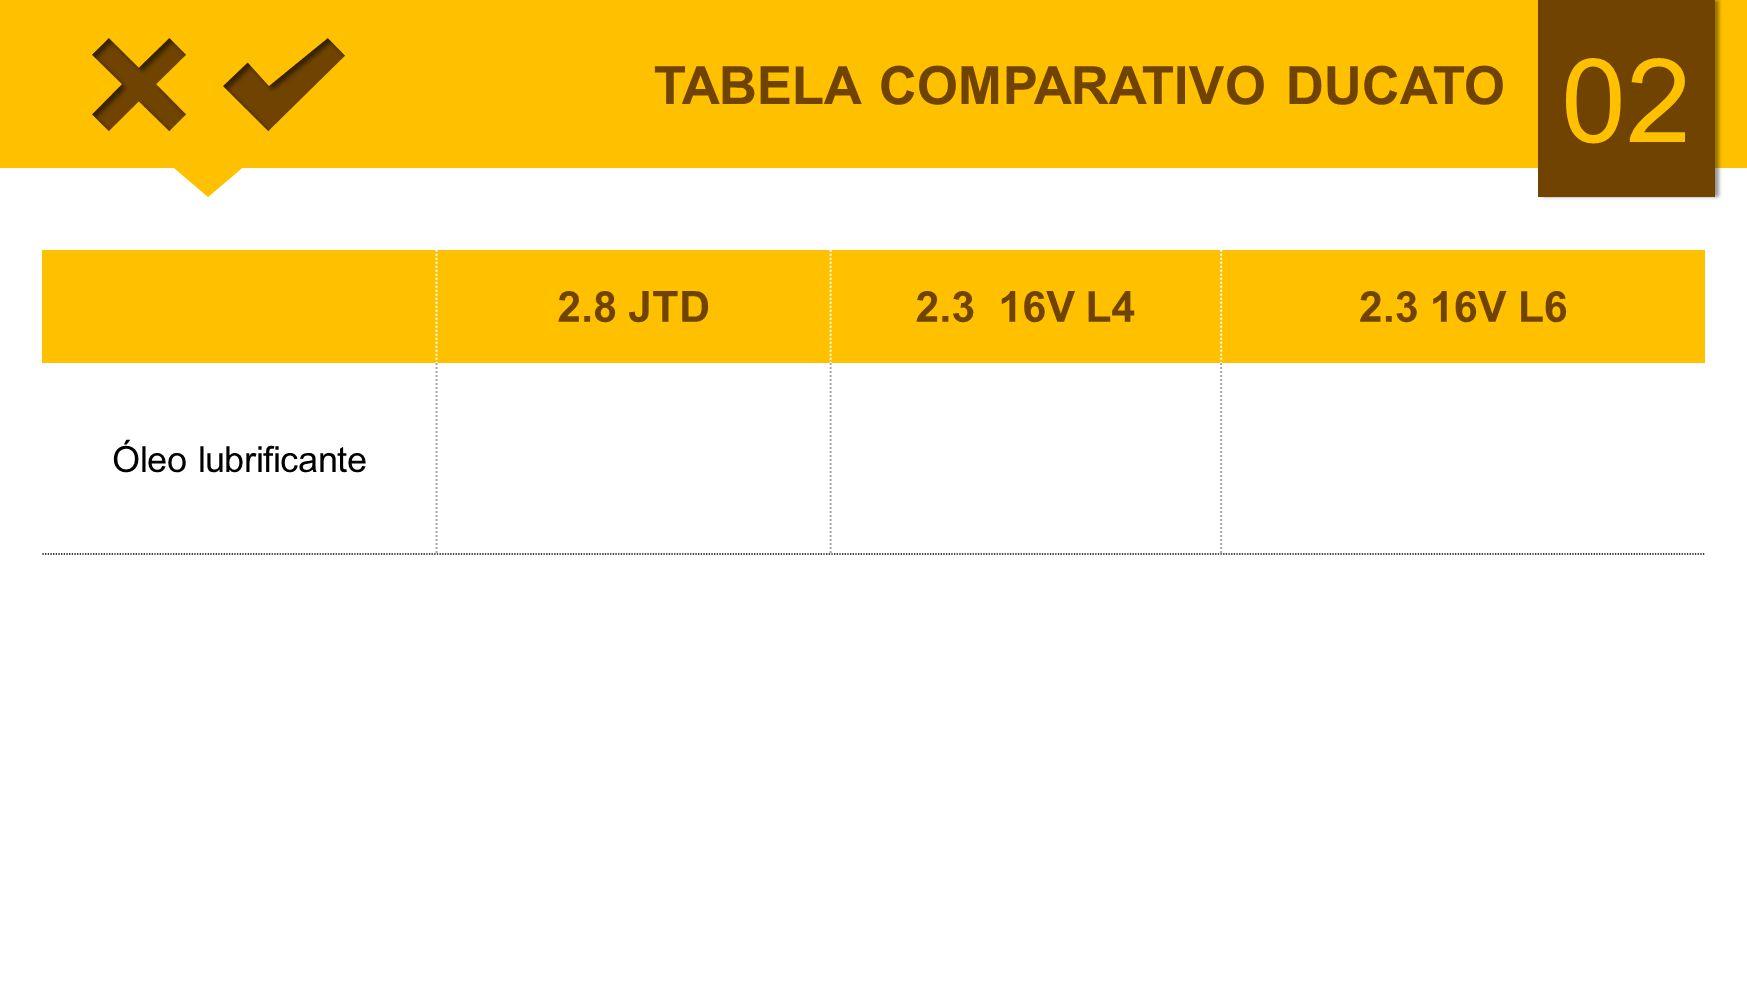 02 TABELA COMPARATIVO DUCATO 2.8 JTD2.3 16V L42.3 16V L6 Óleo lubrificante 5,0 ou 6,1 litros VS MAX Diesel 15W40 5,9 ou 6,3 litros Urania Turbo LD (Mi